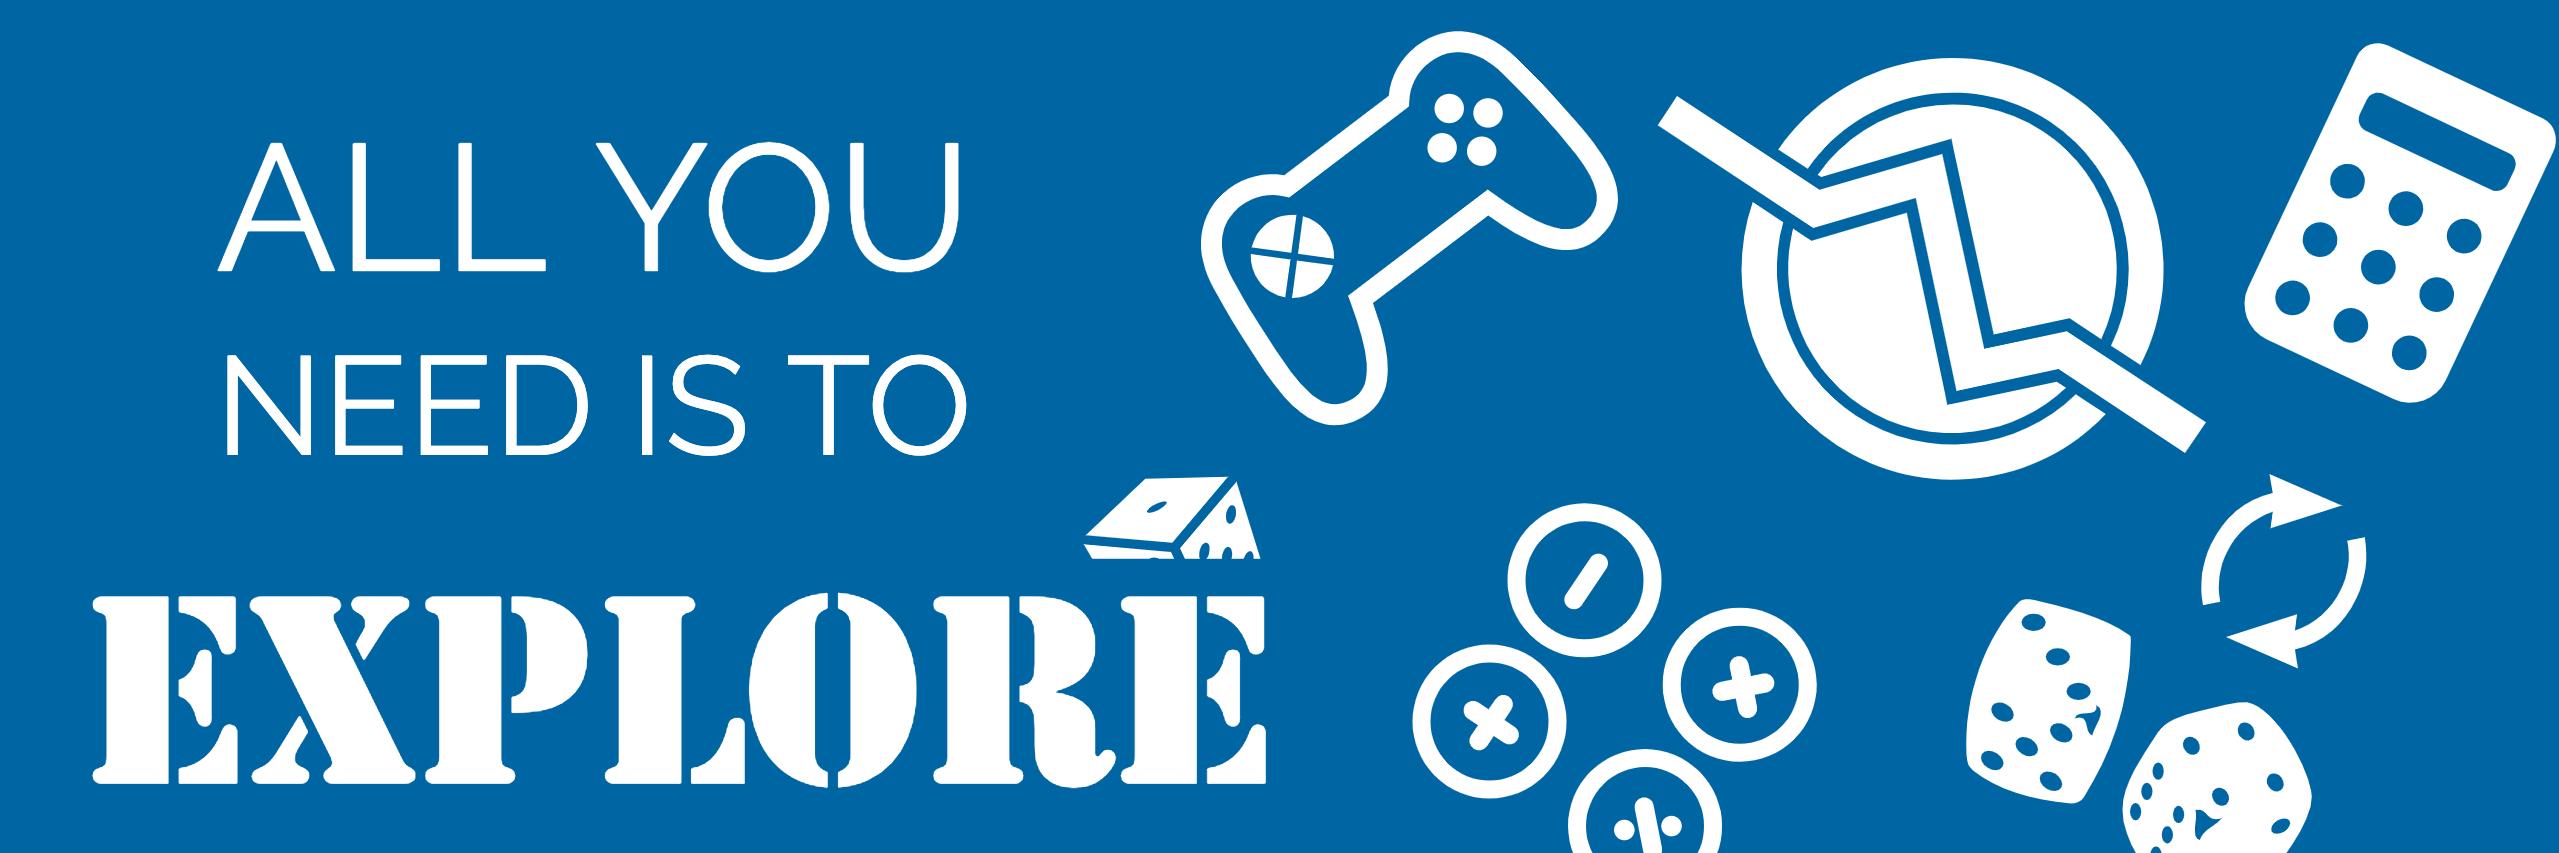 gamesoa intro image